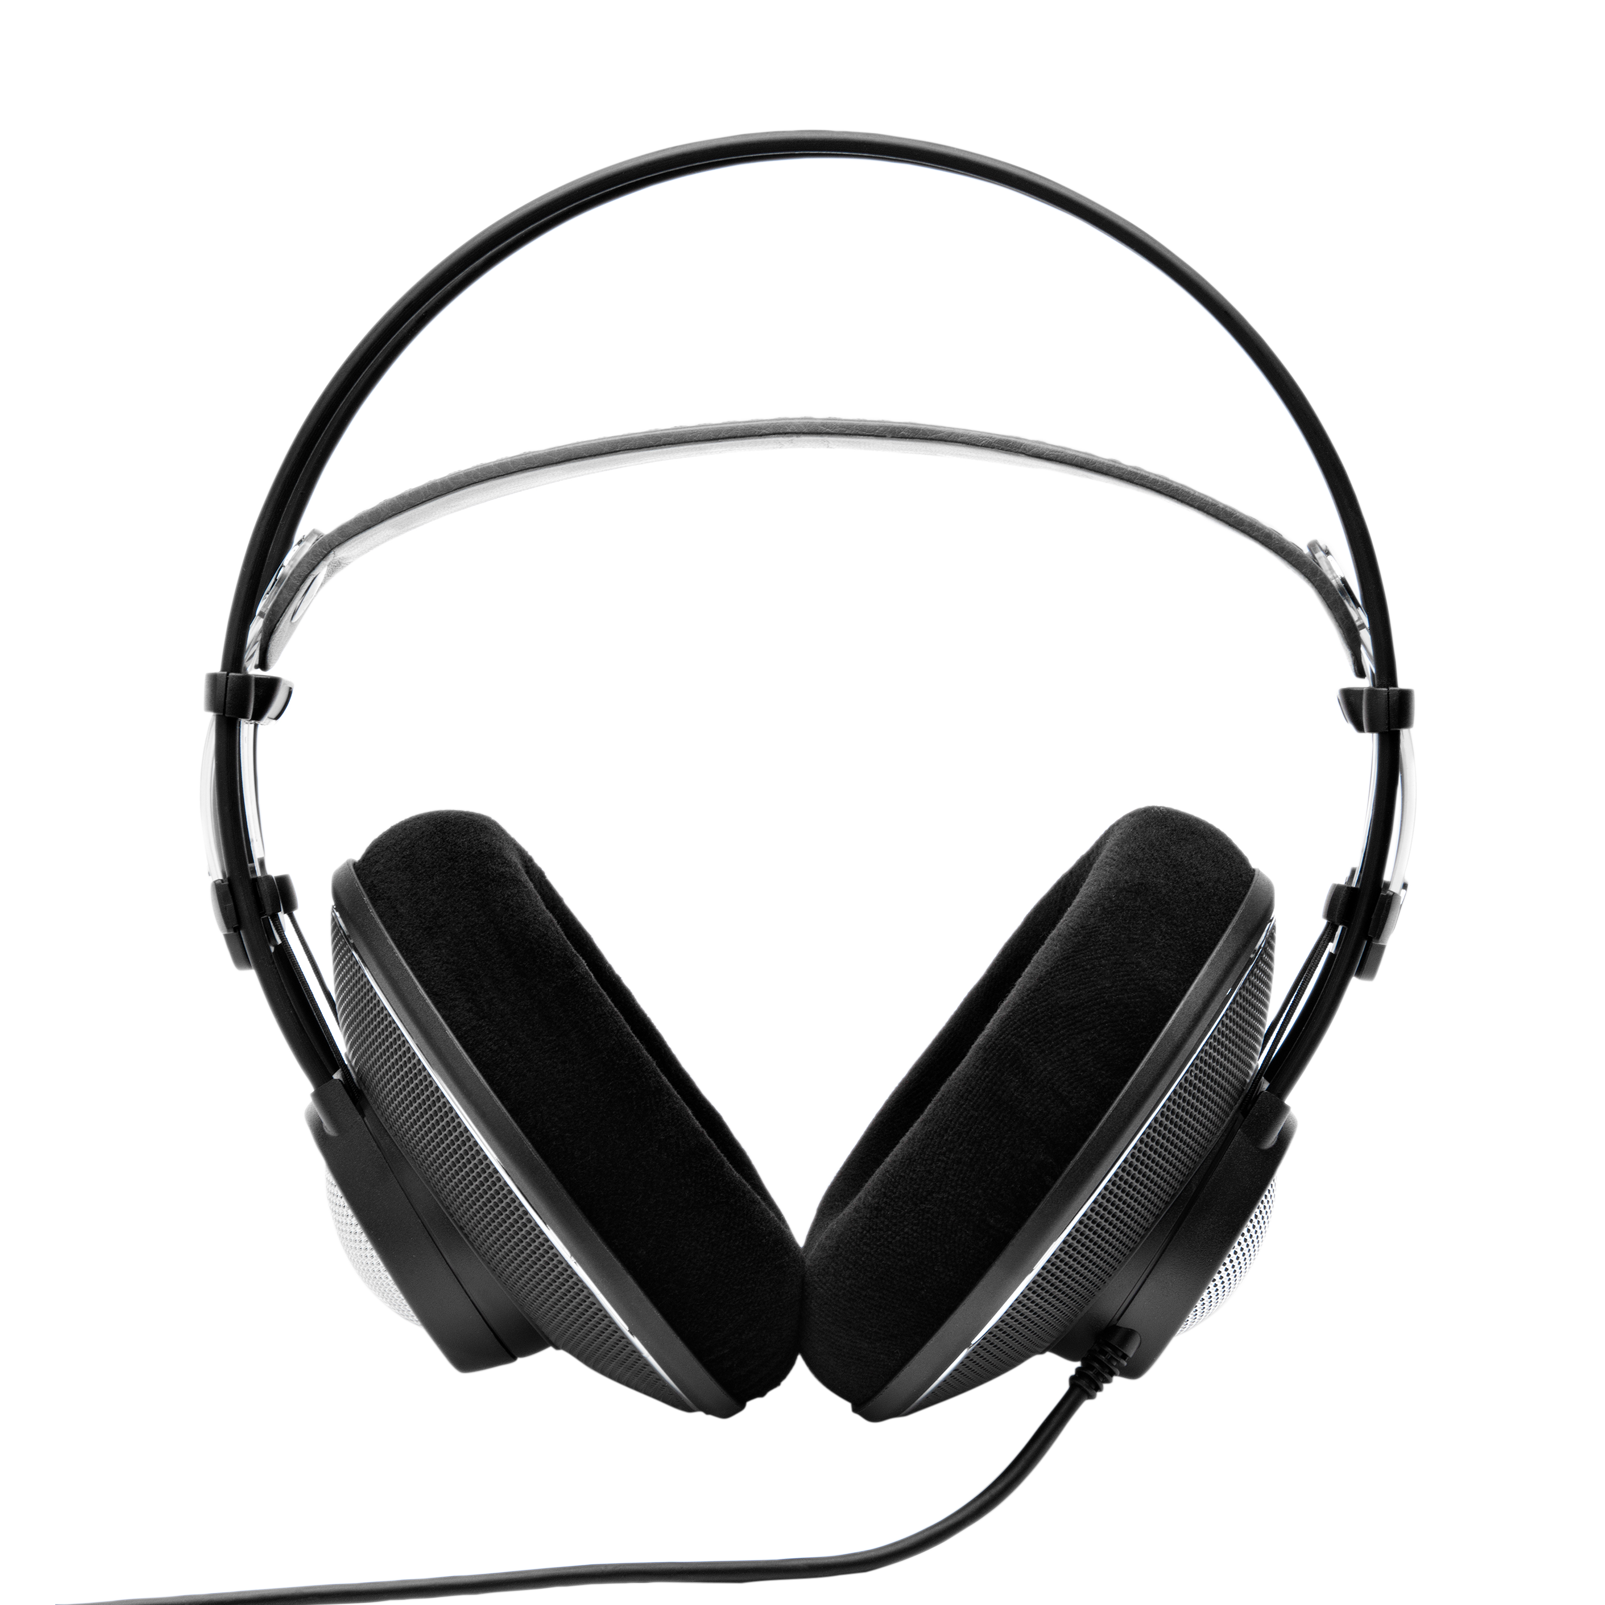 K612 PRO - Black - Reference studio headphones - Front